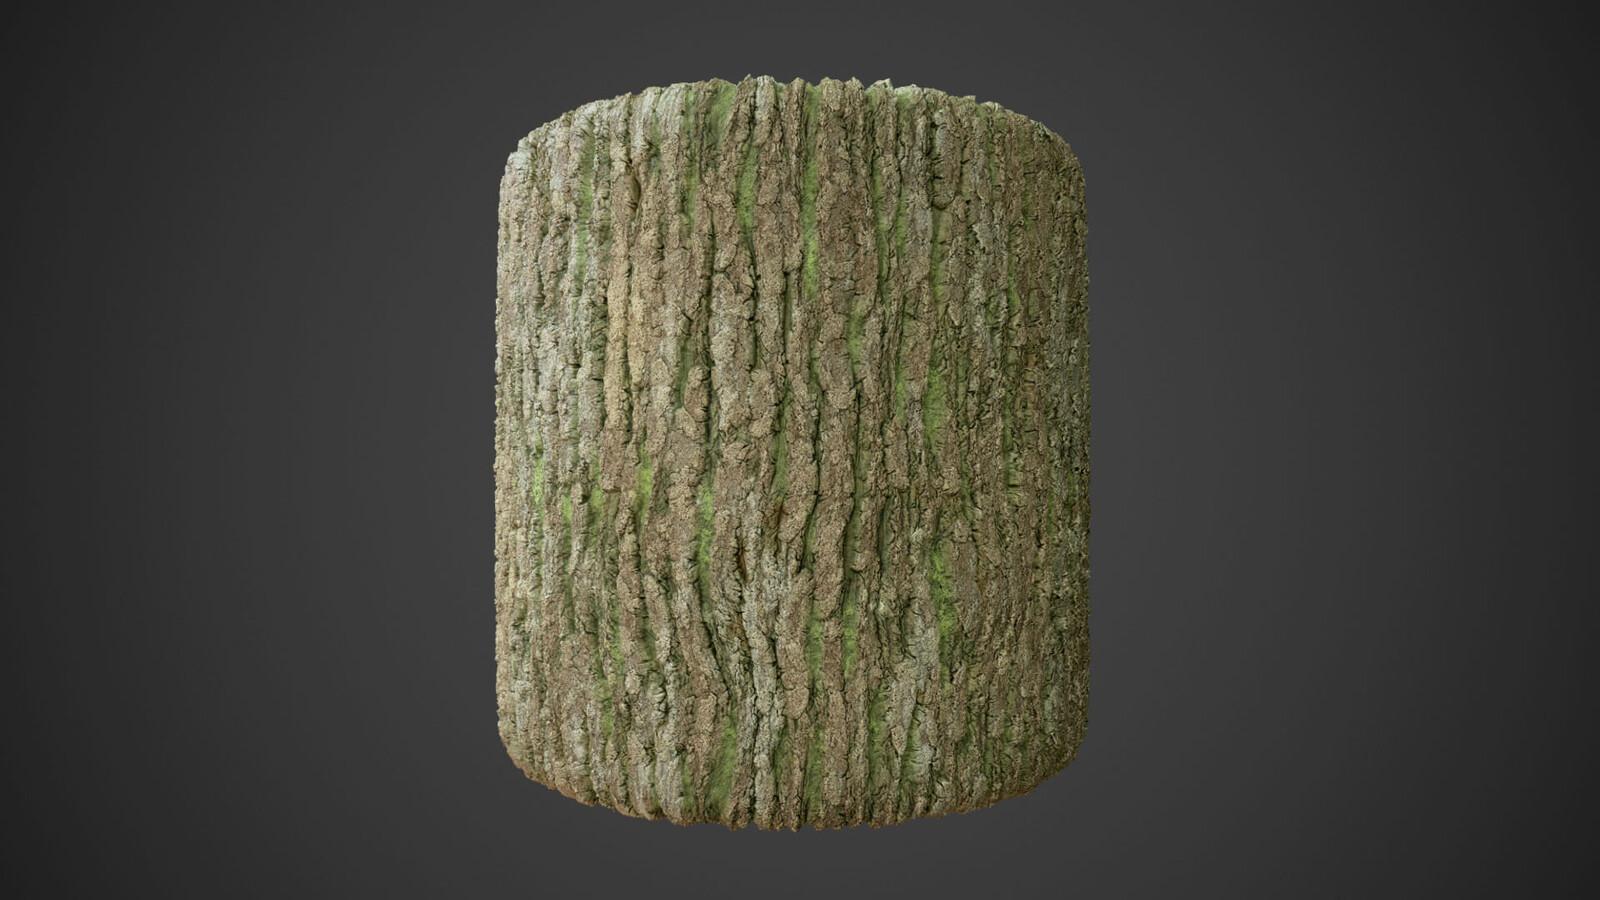 Bark created in Substance Designer